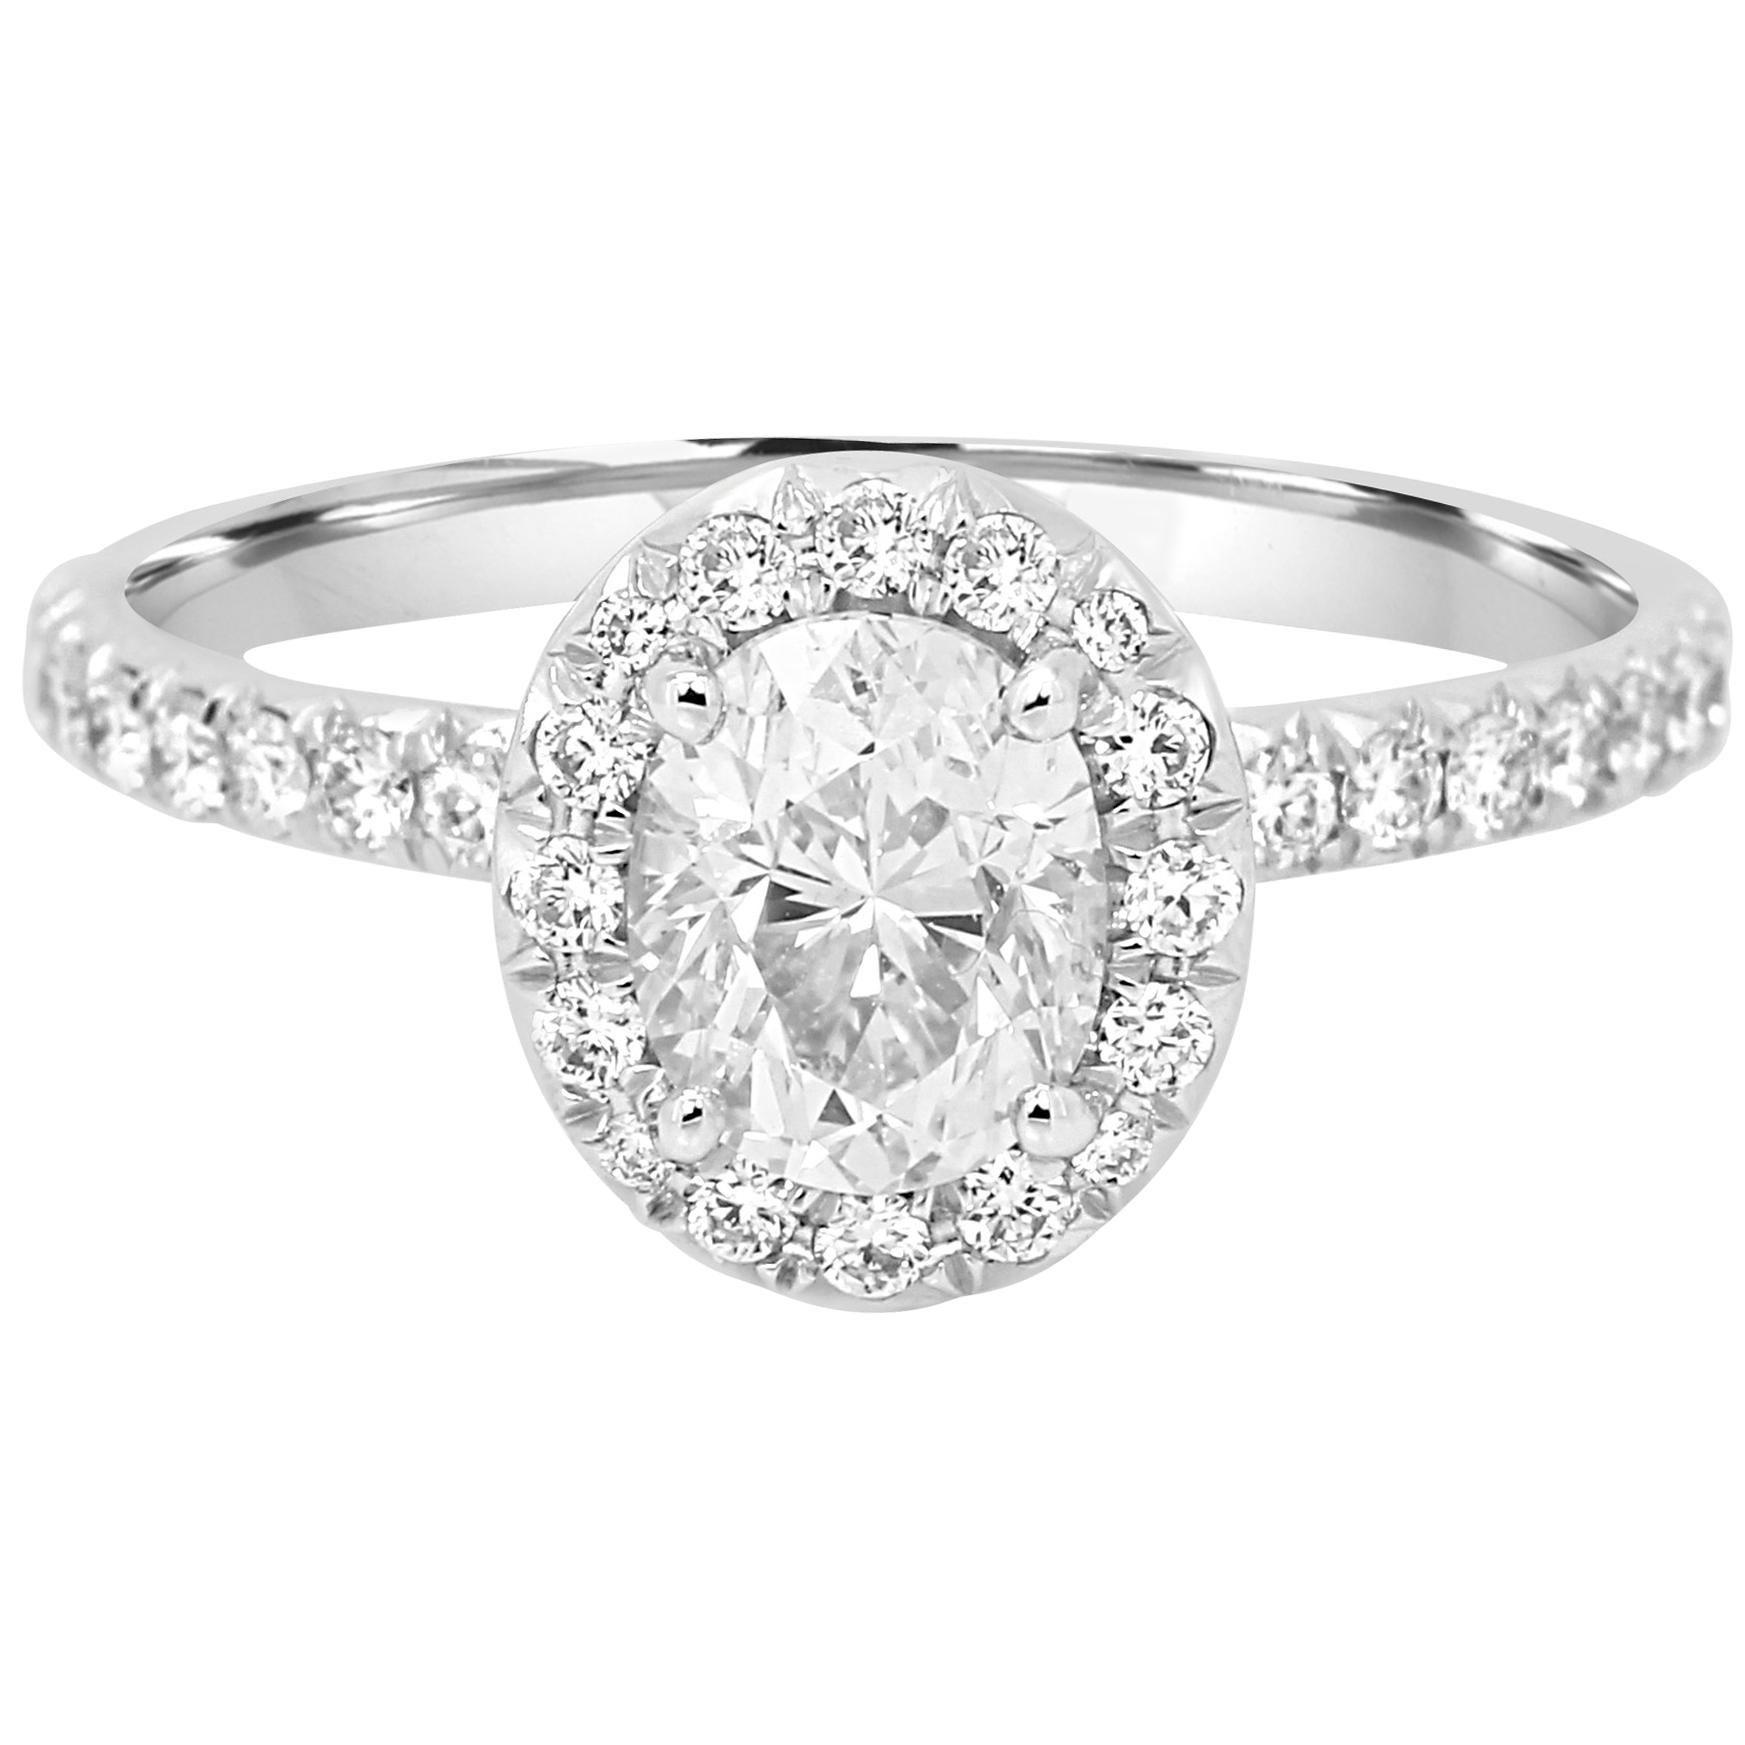 GIA Certified 1.01 Carat Oval Diamond Halo Gold Platinum Engagement Bridal Ring